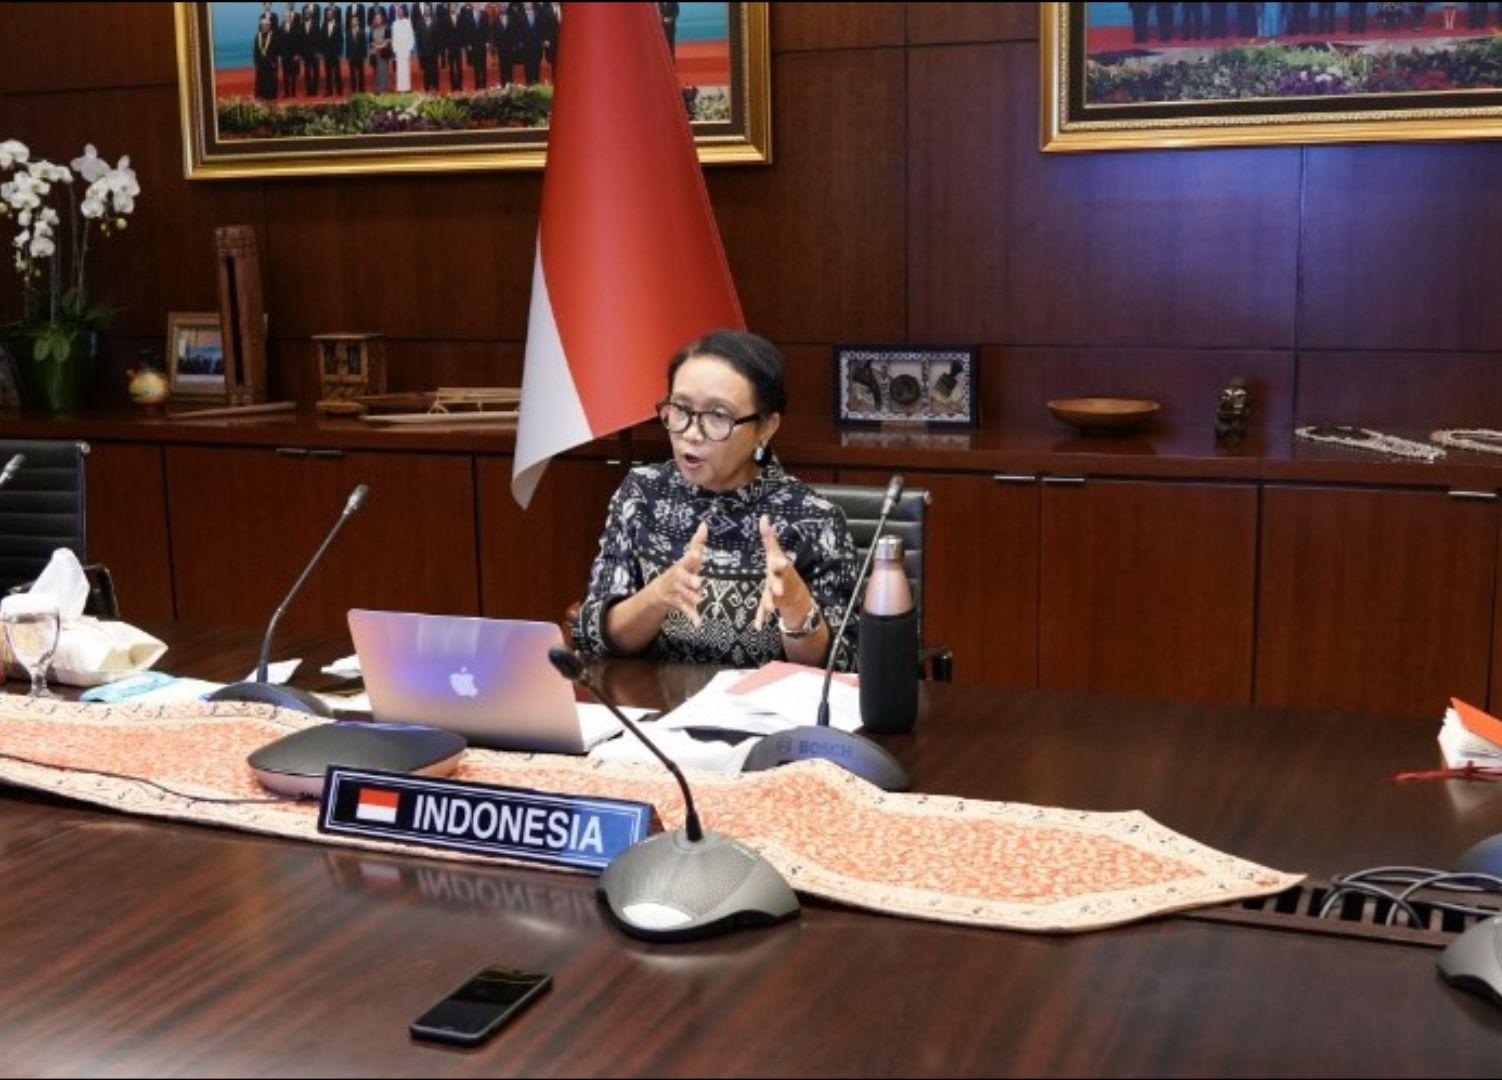 Abaikan Janji Bantuan 28 Triliun, Indonesia Tolak Buka ...